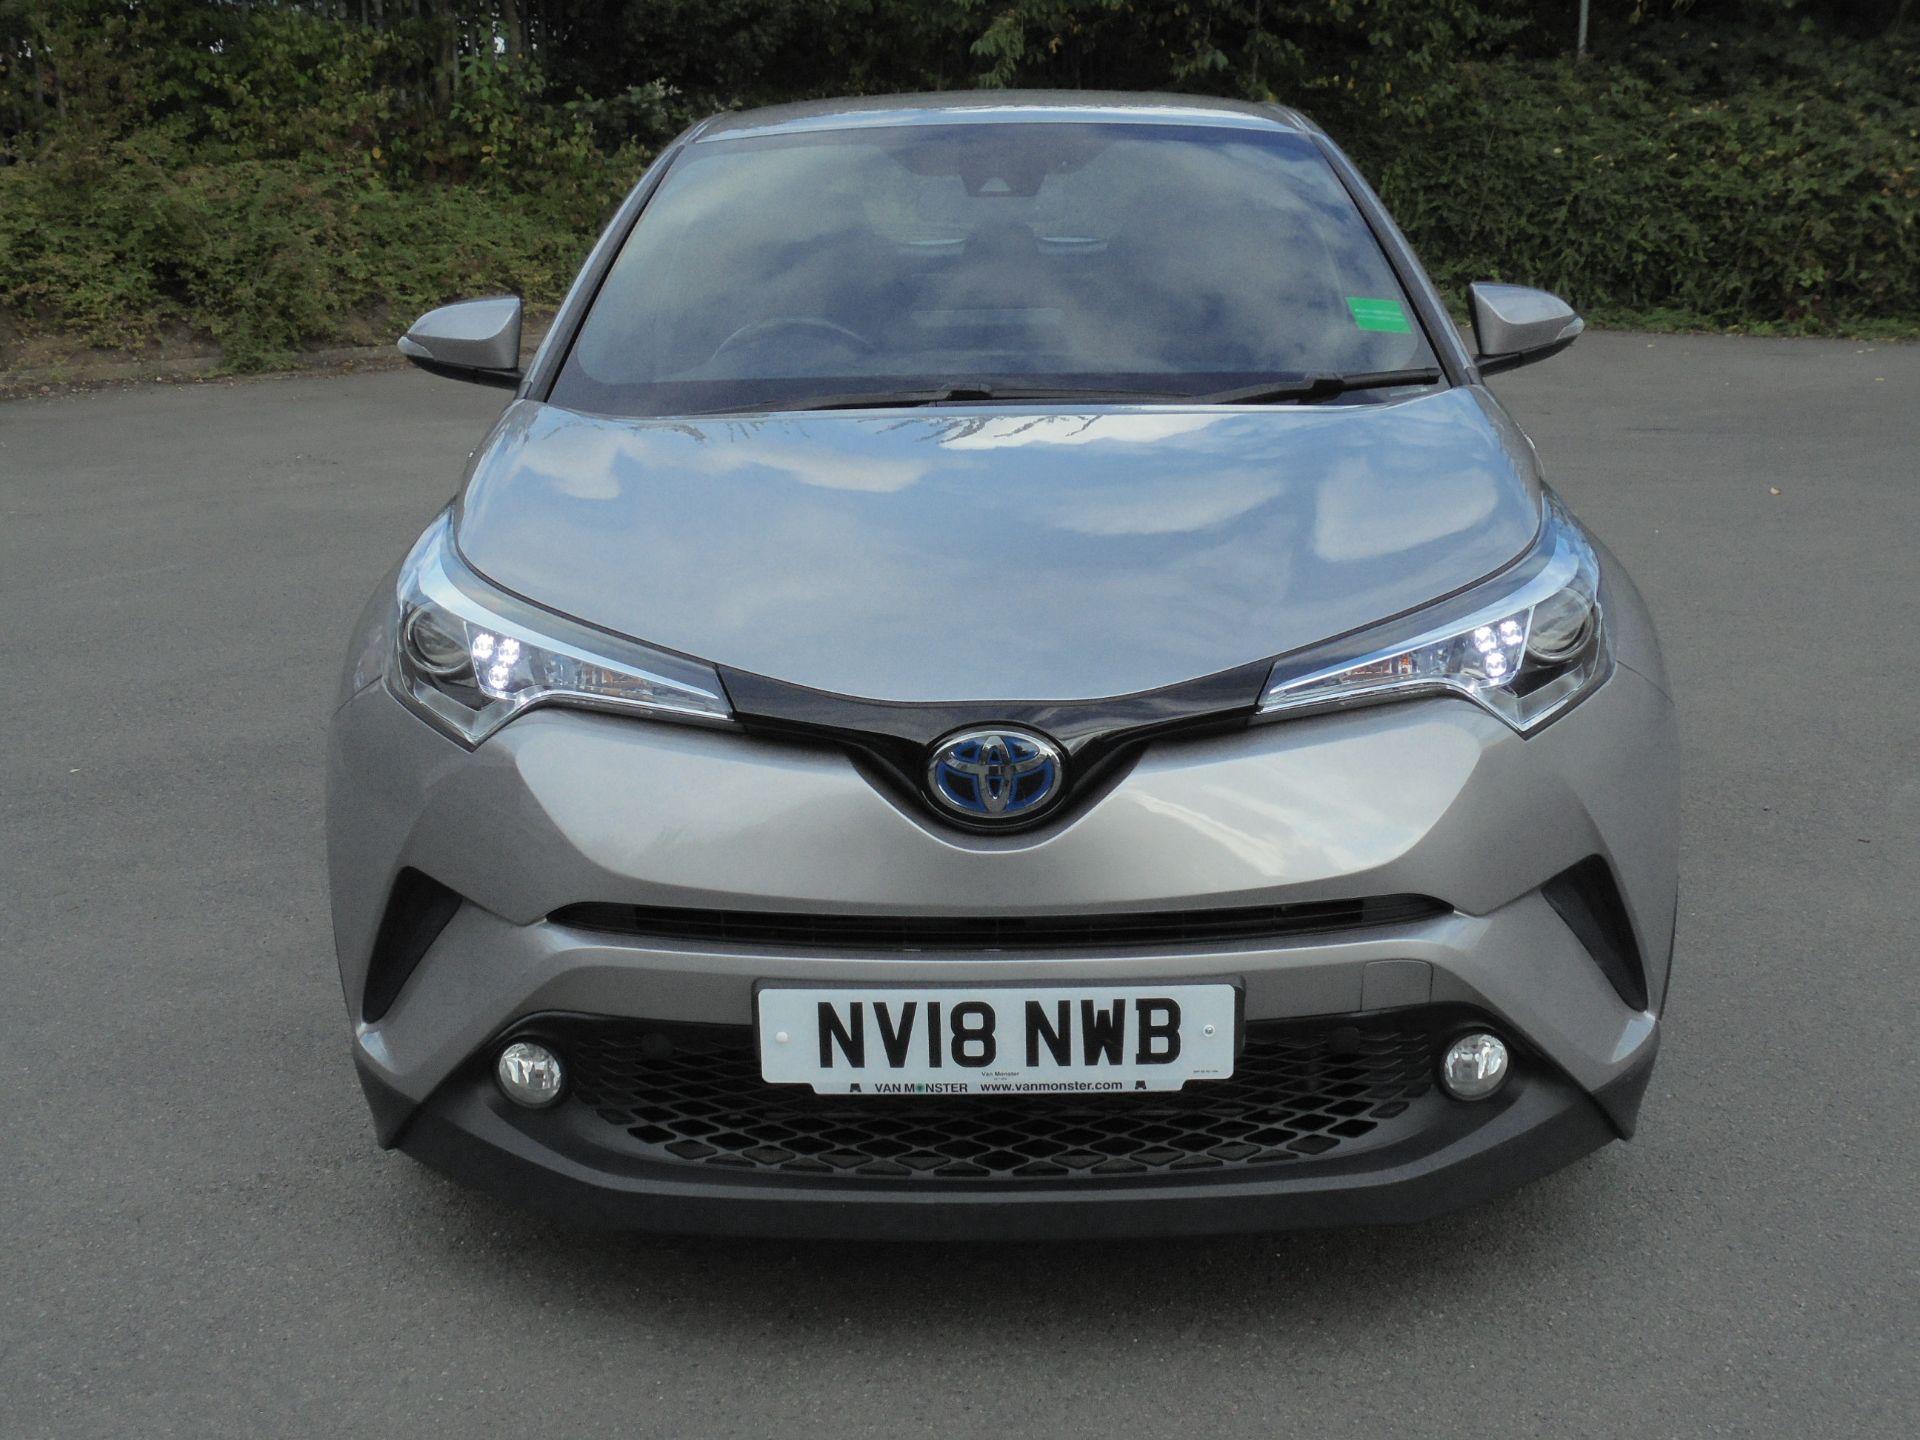 2018 Toyota C-Hr 1.8 Hybrid Icon 5Dr Cvt (NV18NWB) Image 2